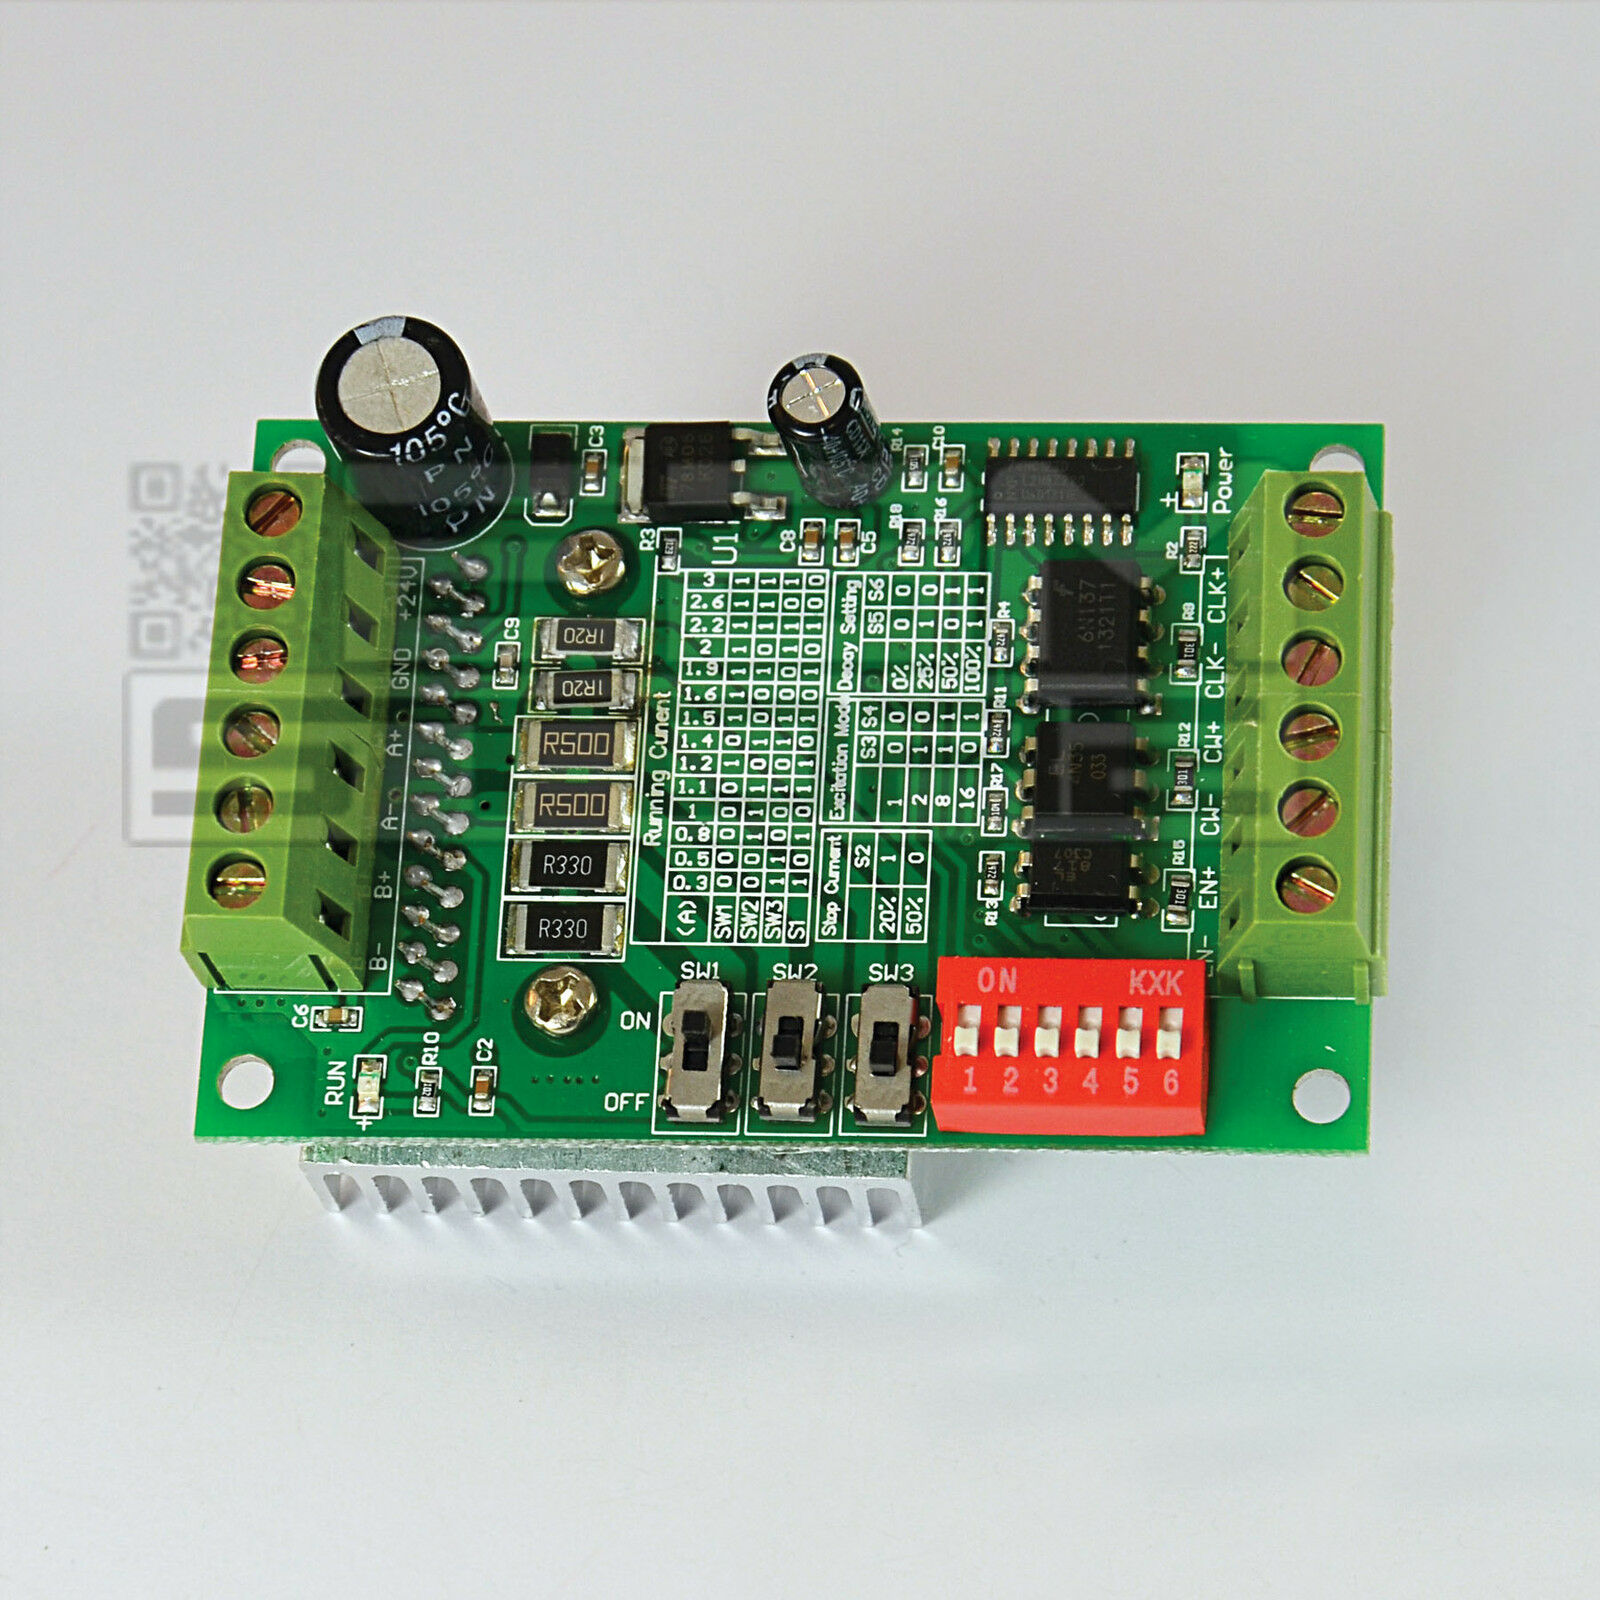 Driver 1 asse TB6560 per motori passo passo stepper cnc arduino pic - ART. CO03